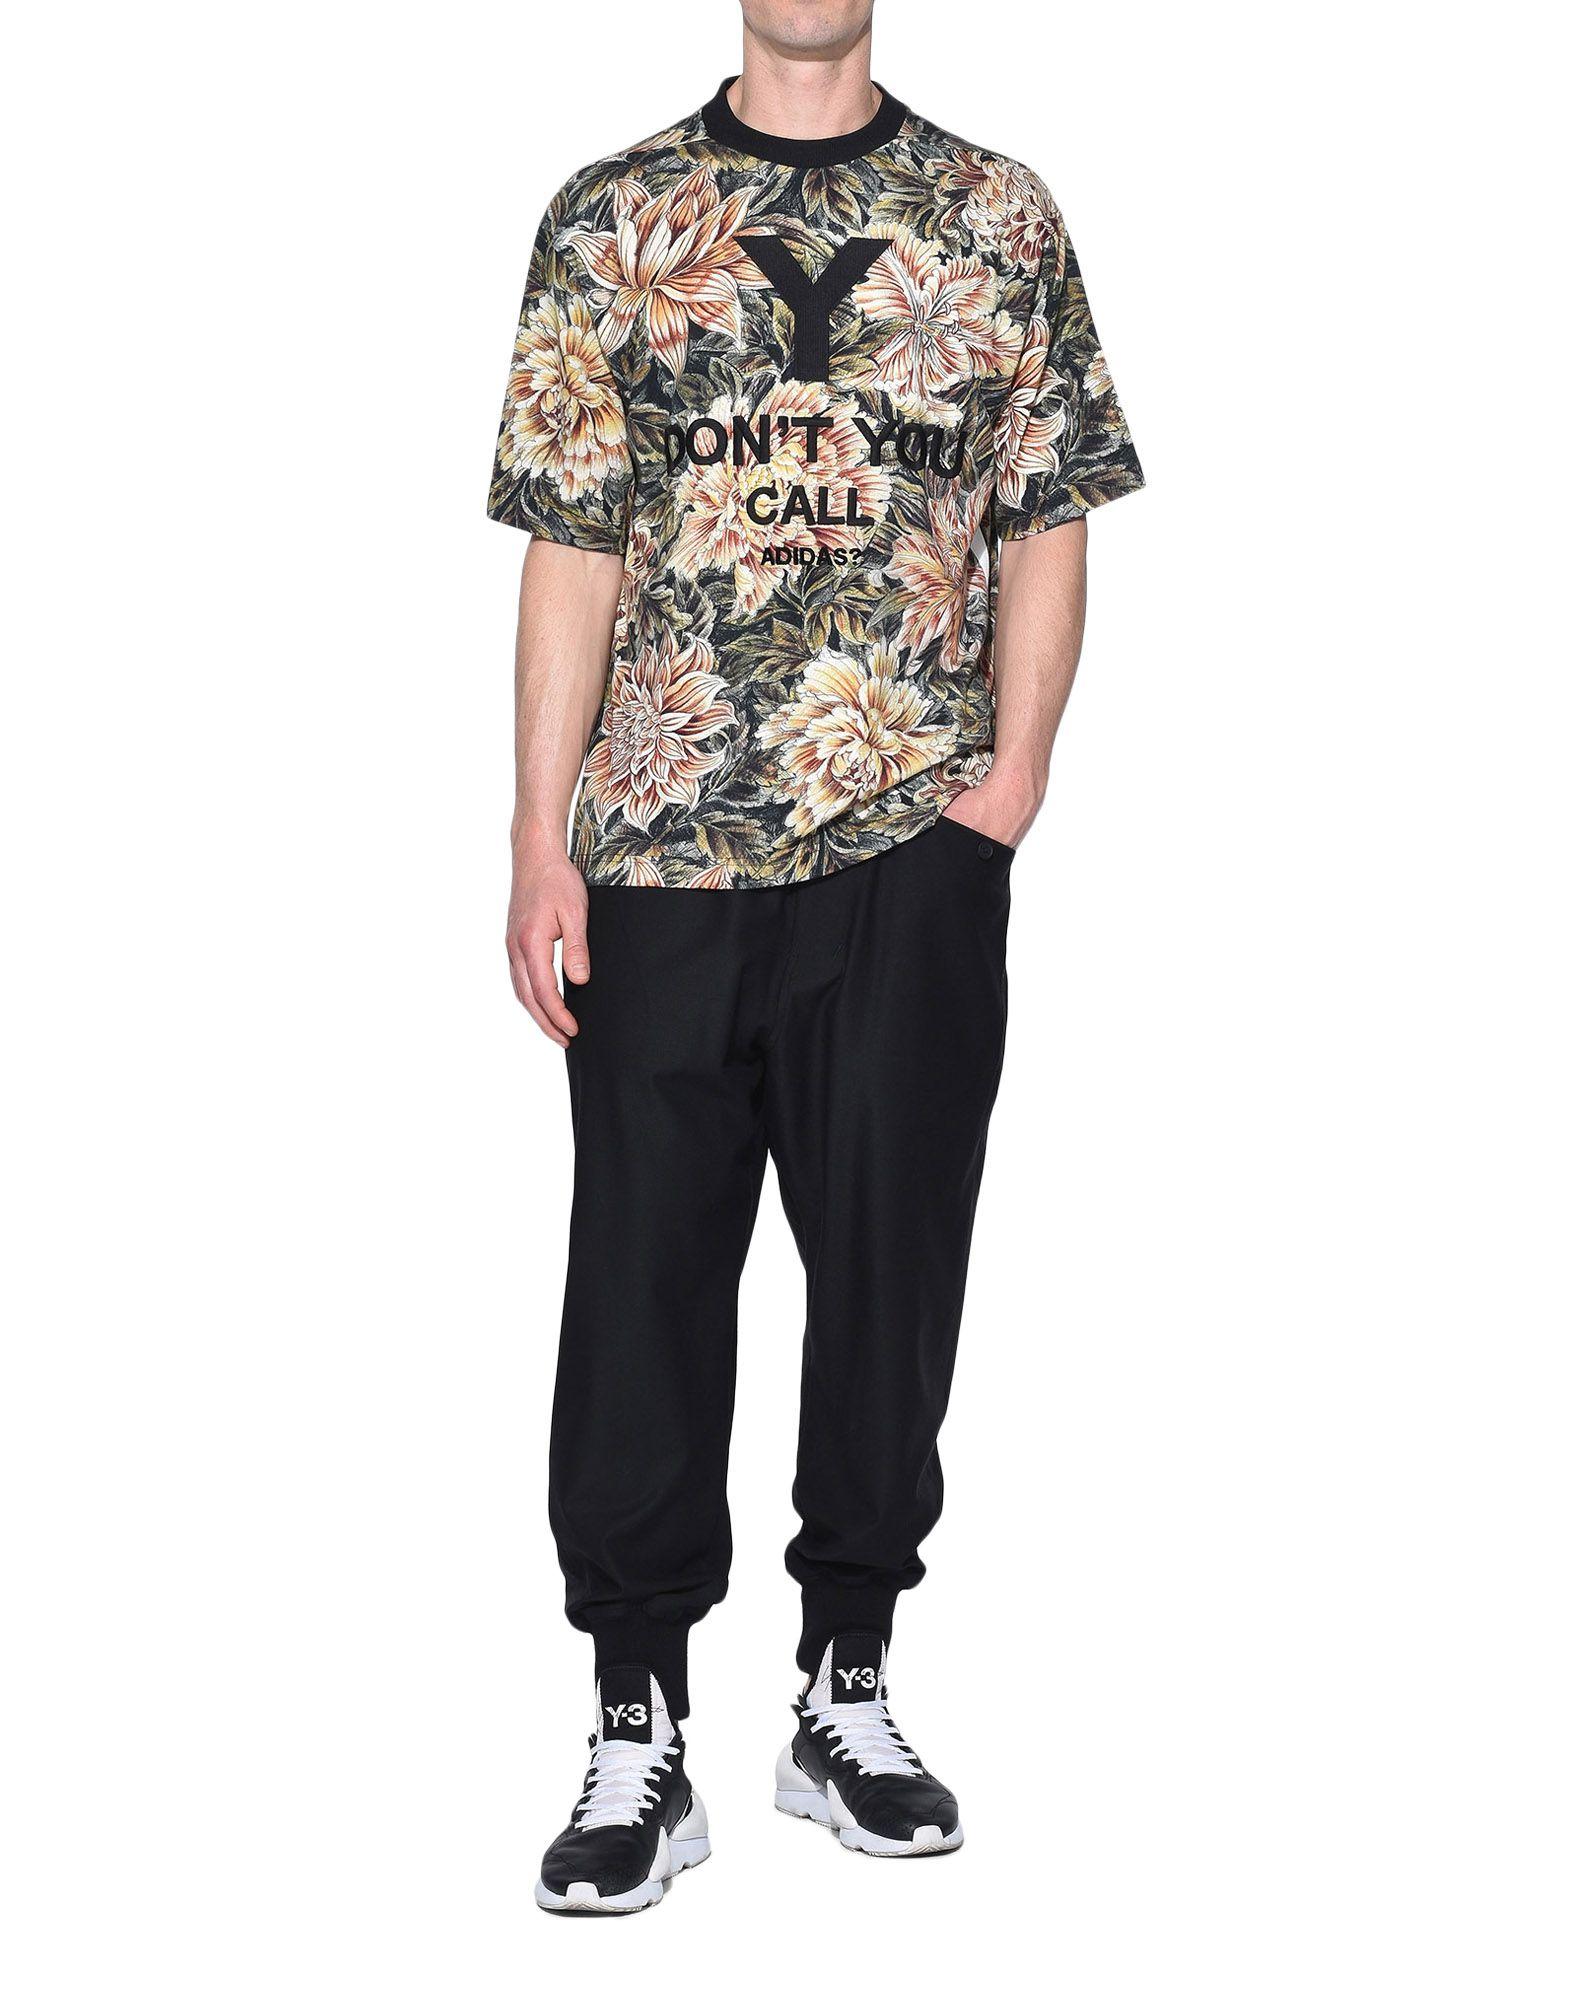 Y-3 Y-3 AOP High Neck Tee Short sleeve t-shirt Man a